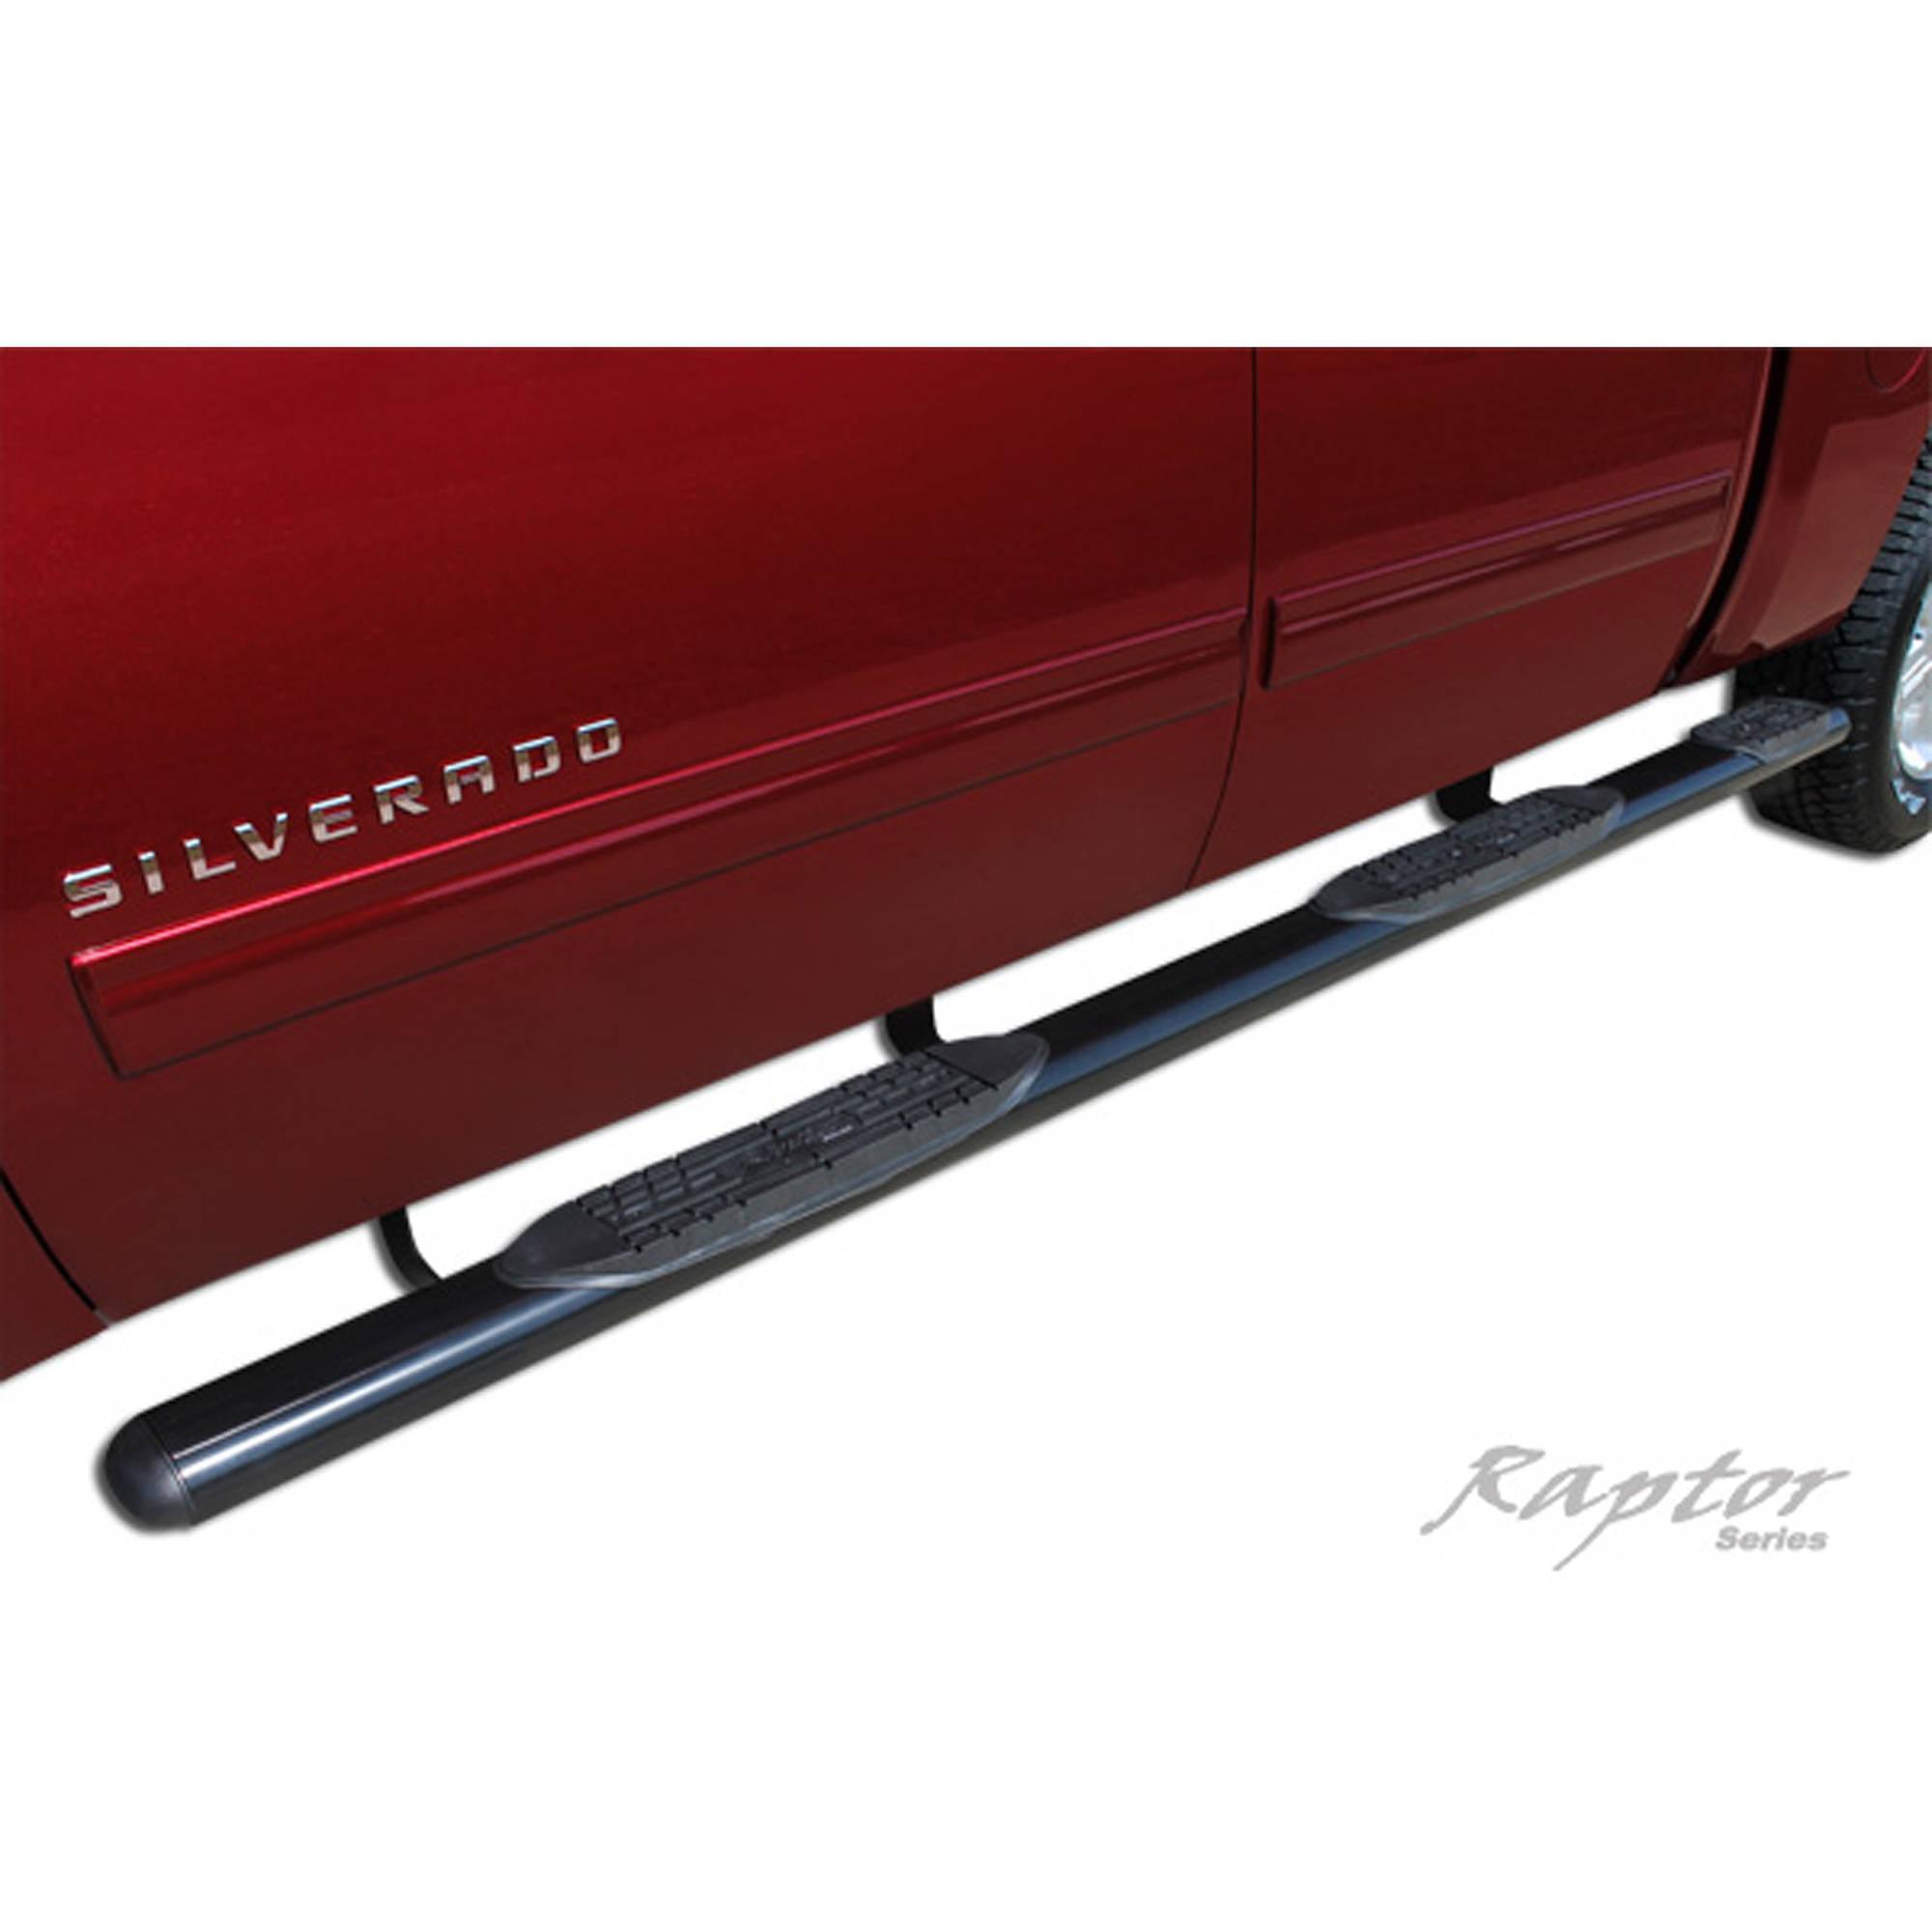 "Raptor Series 10-15 Dodge Ram 1500/2500 Crew Cab (Including EcoDiesel) (6.4' Bed) 5"" Black W2W Oval Steps (Rocker Panel Mount)"